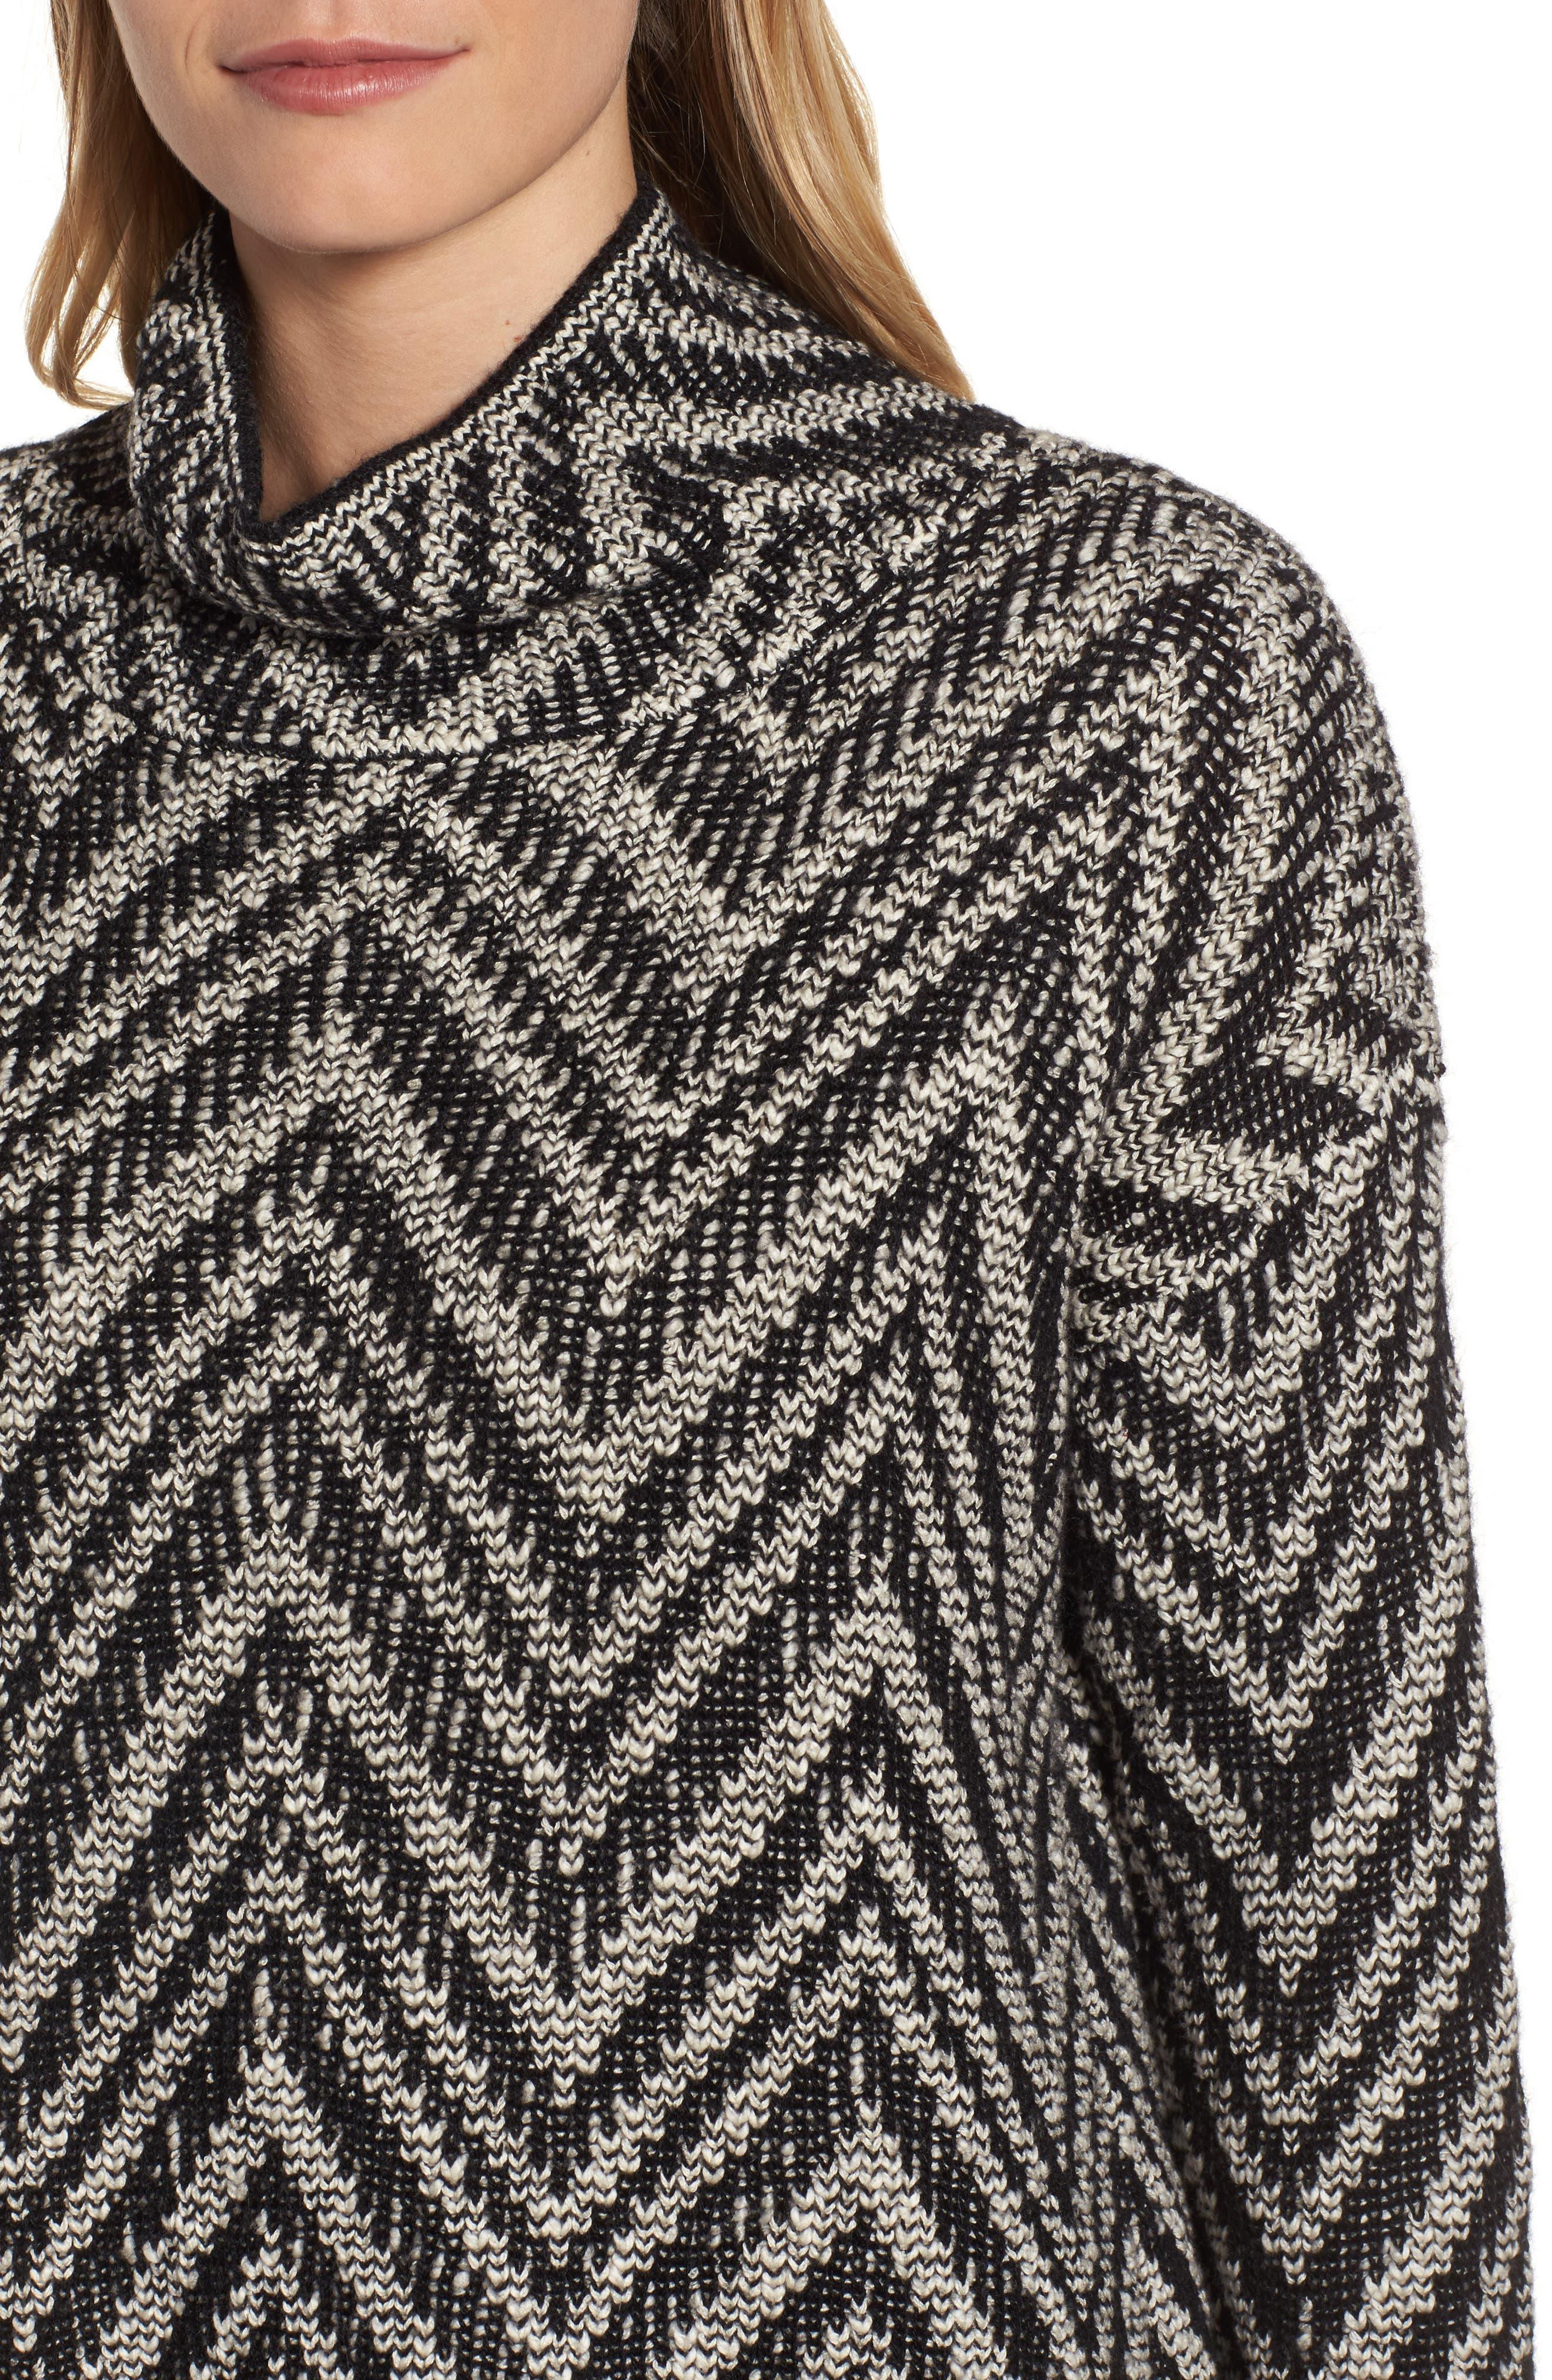 Zigzag Organic Cotton & Alpaca Tunic Sweater,                             Alternate thumbnail 4, color,                             112